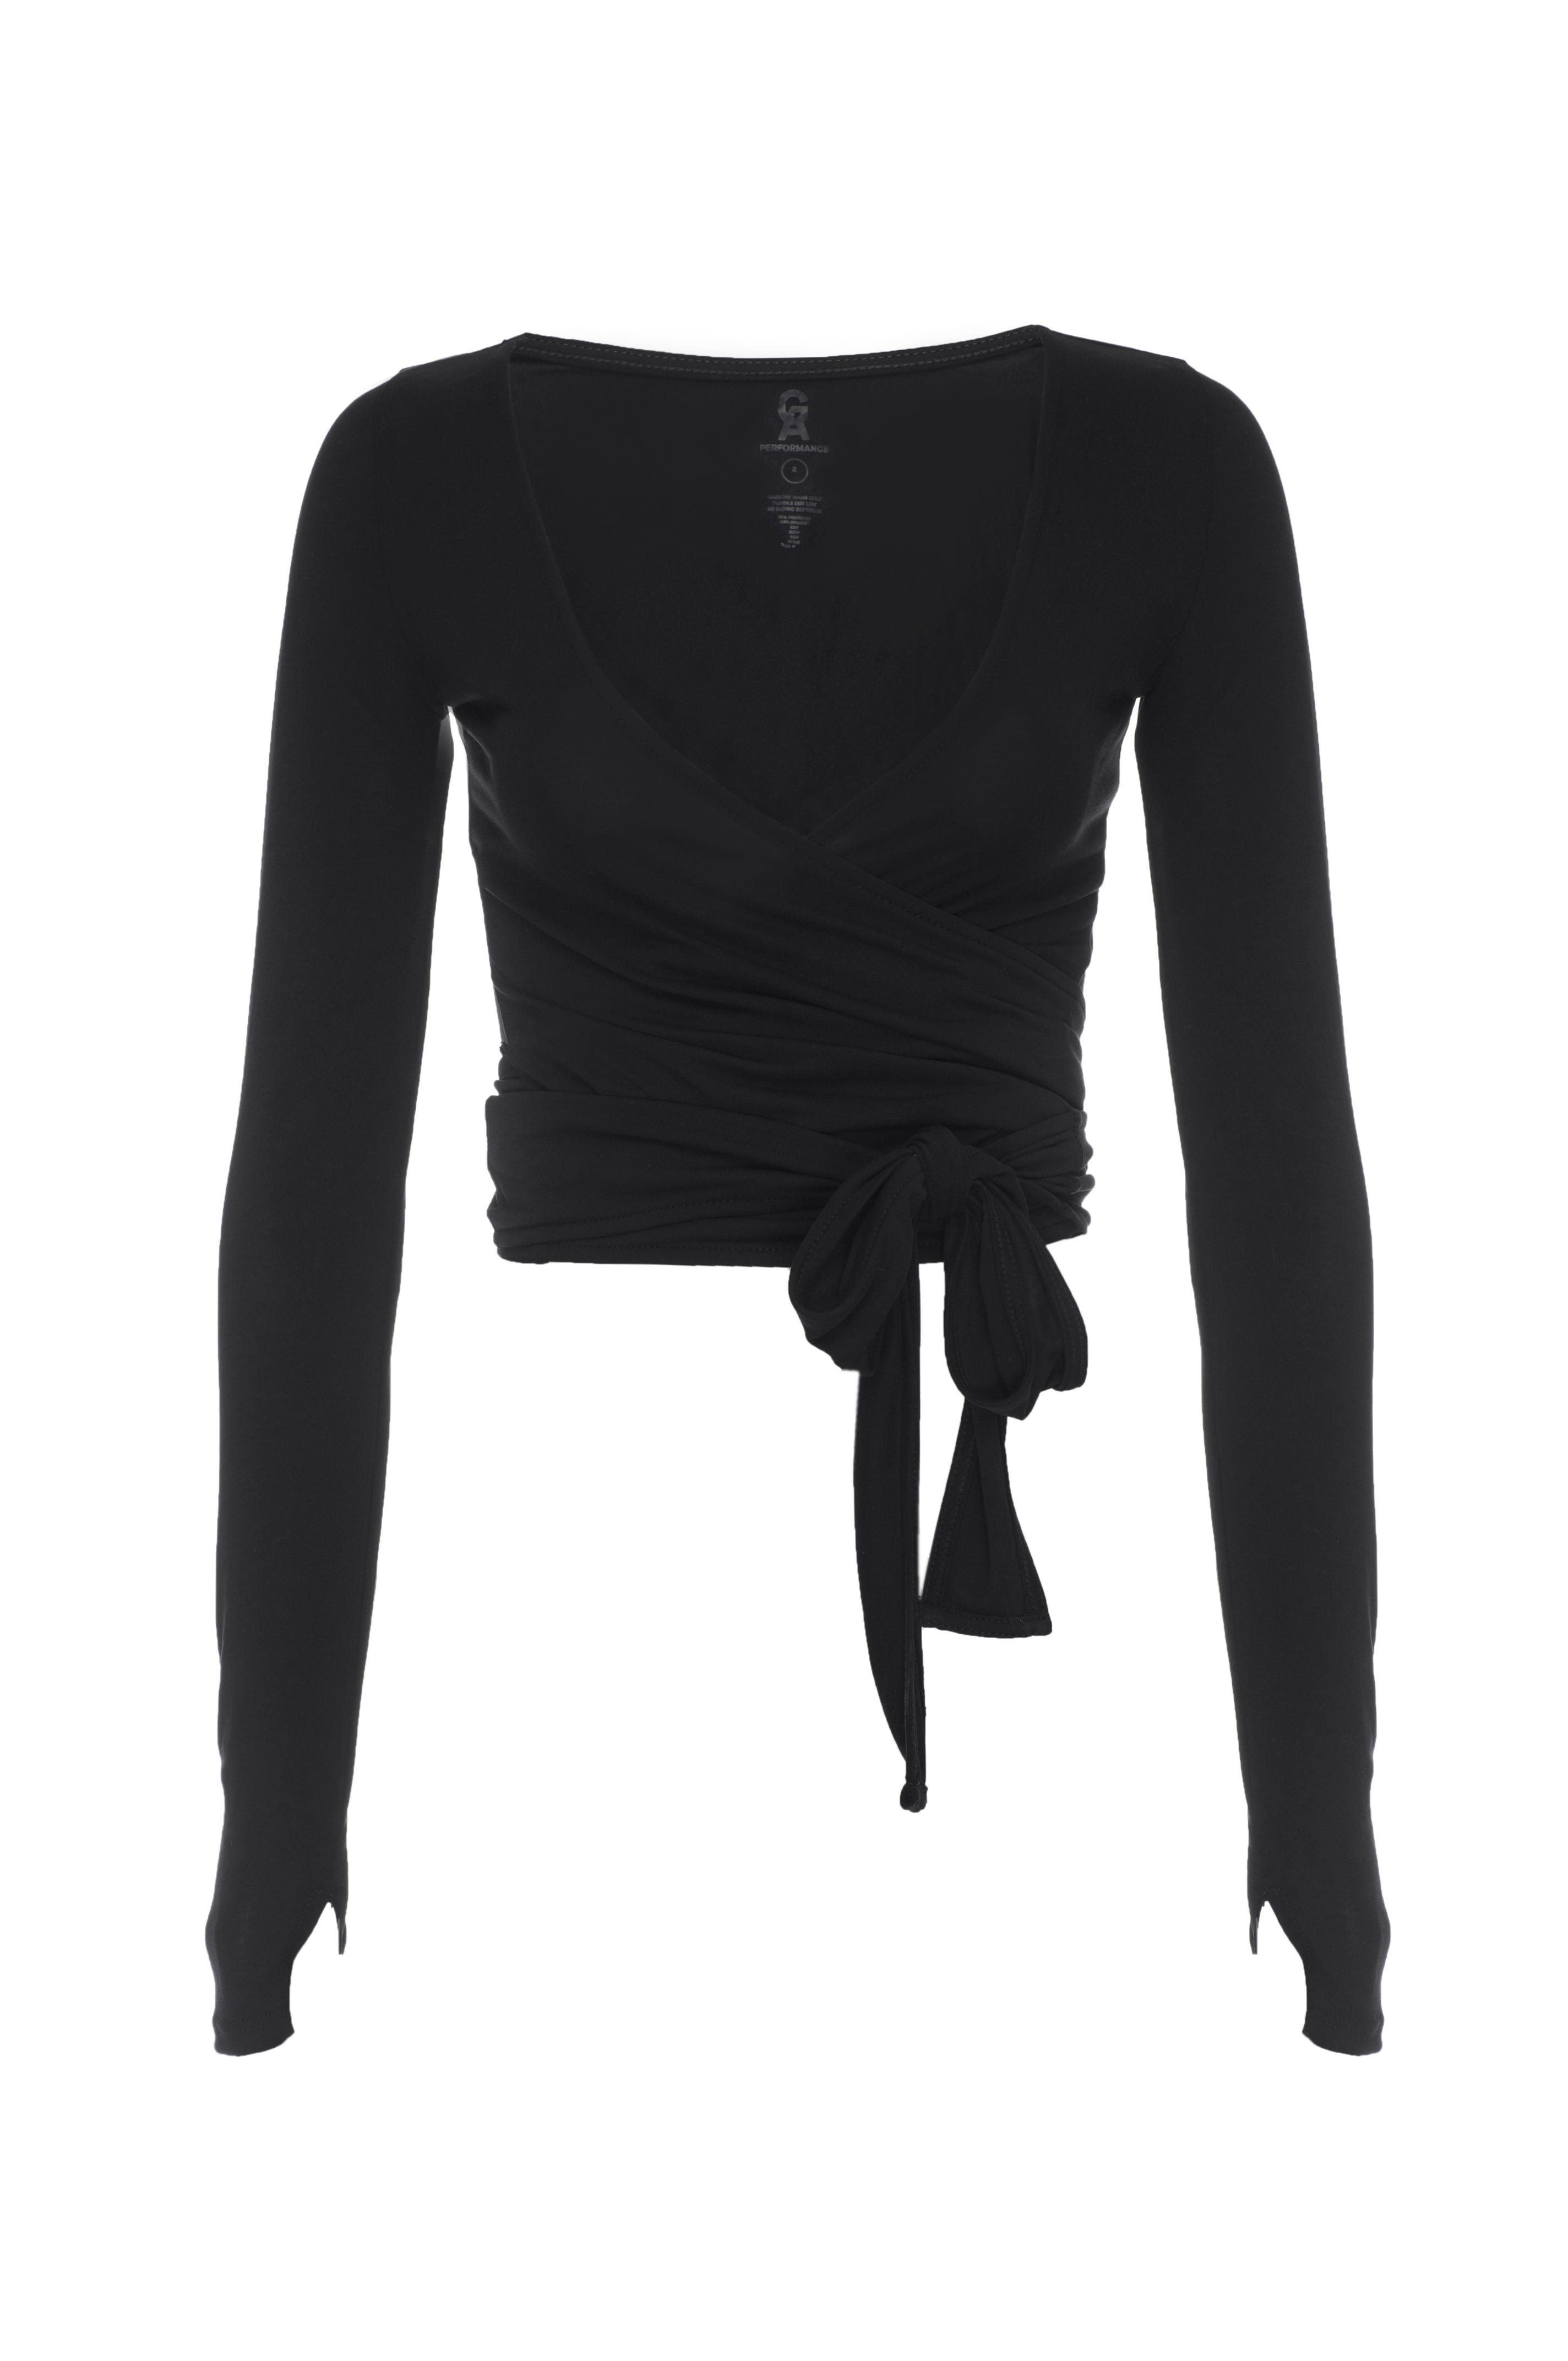 3deb66c74d0e Khloe Kardashian Good American Launches Activewear Line